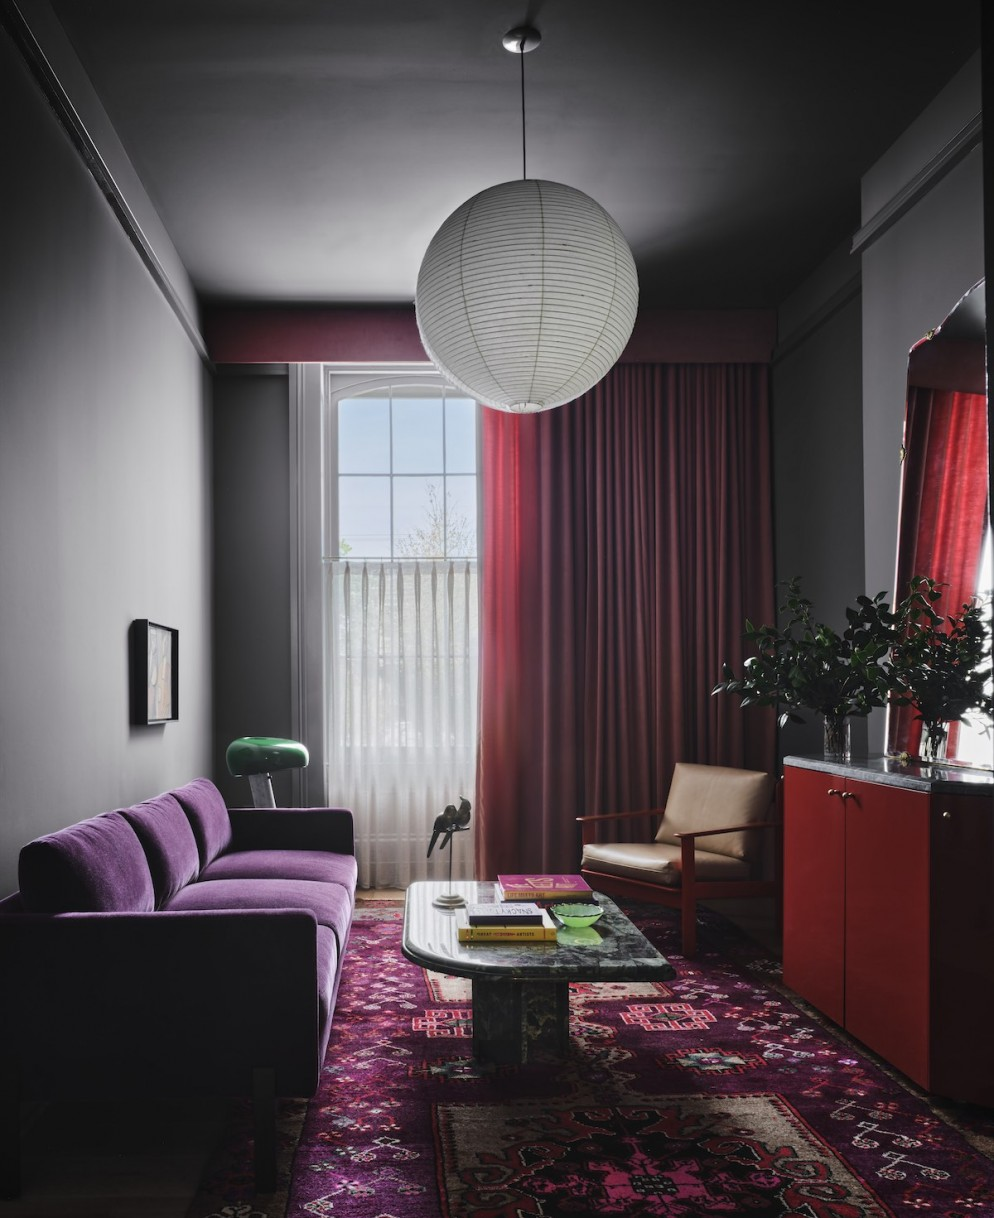 Hotel Saint Vincent - Room x Seating Area - by Douglas Friedman